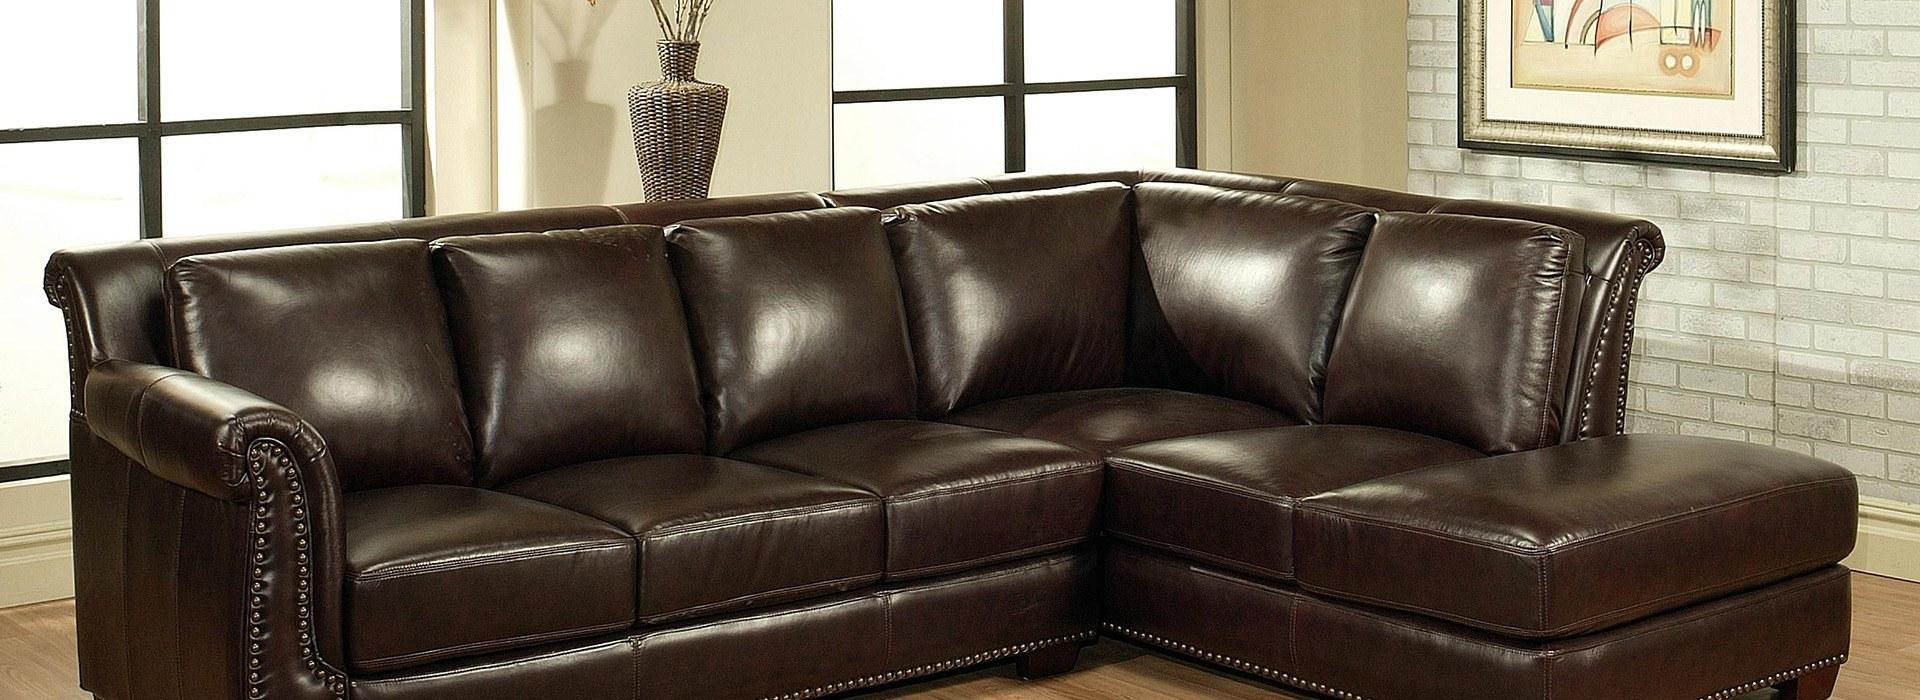 Furniture-Lab-Las-Vegas-Upholstery-0005